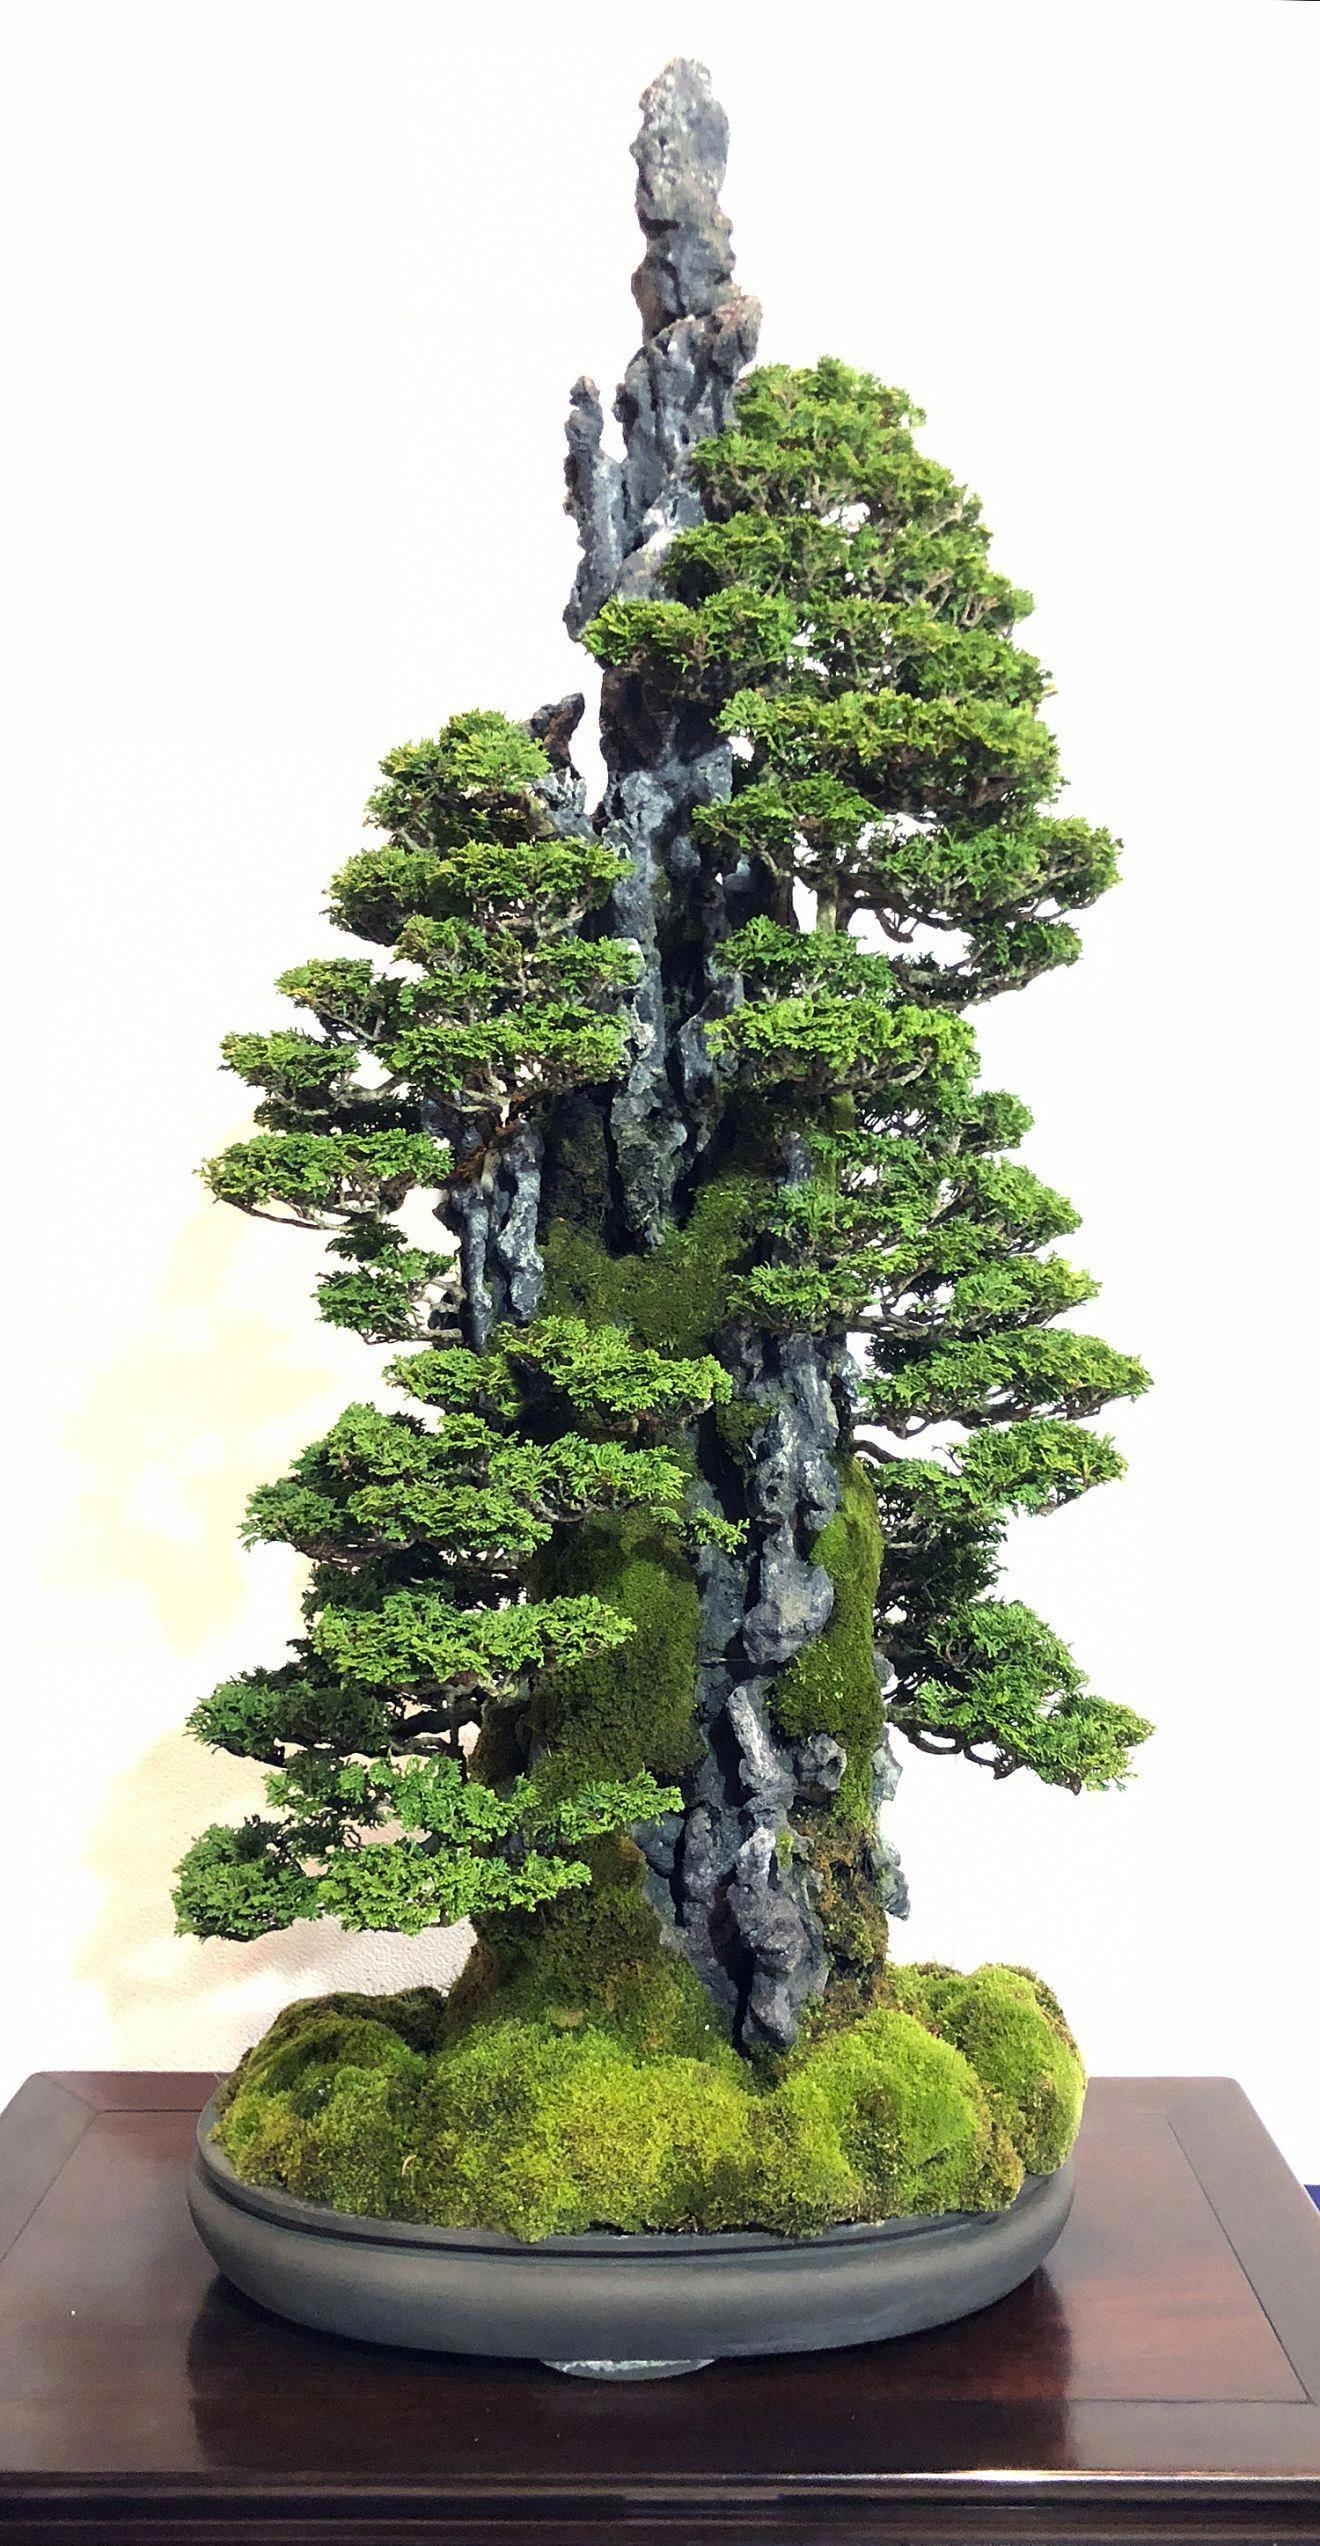 What Is An Outdoor Bonsai Bonsai Garden Indoor Bonsai Tree